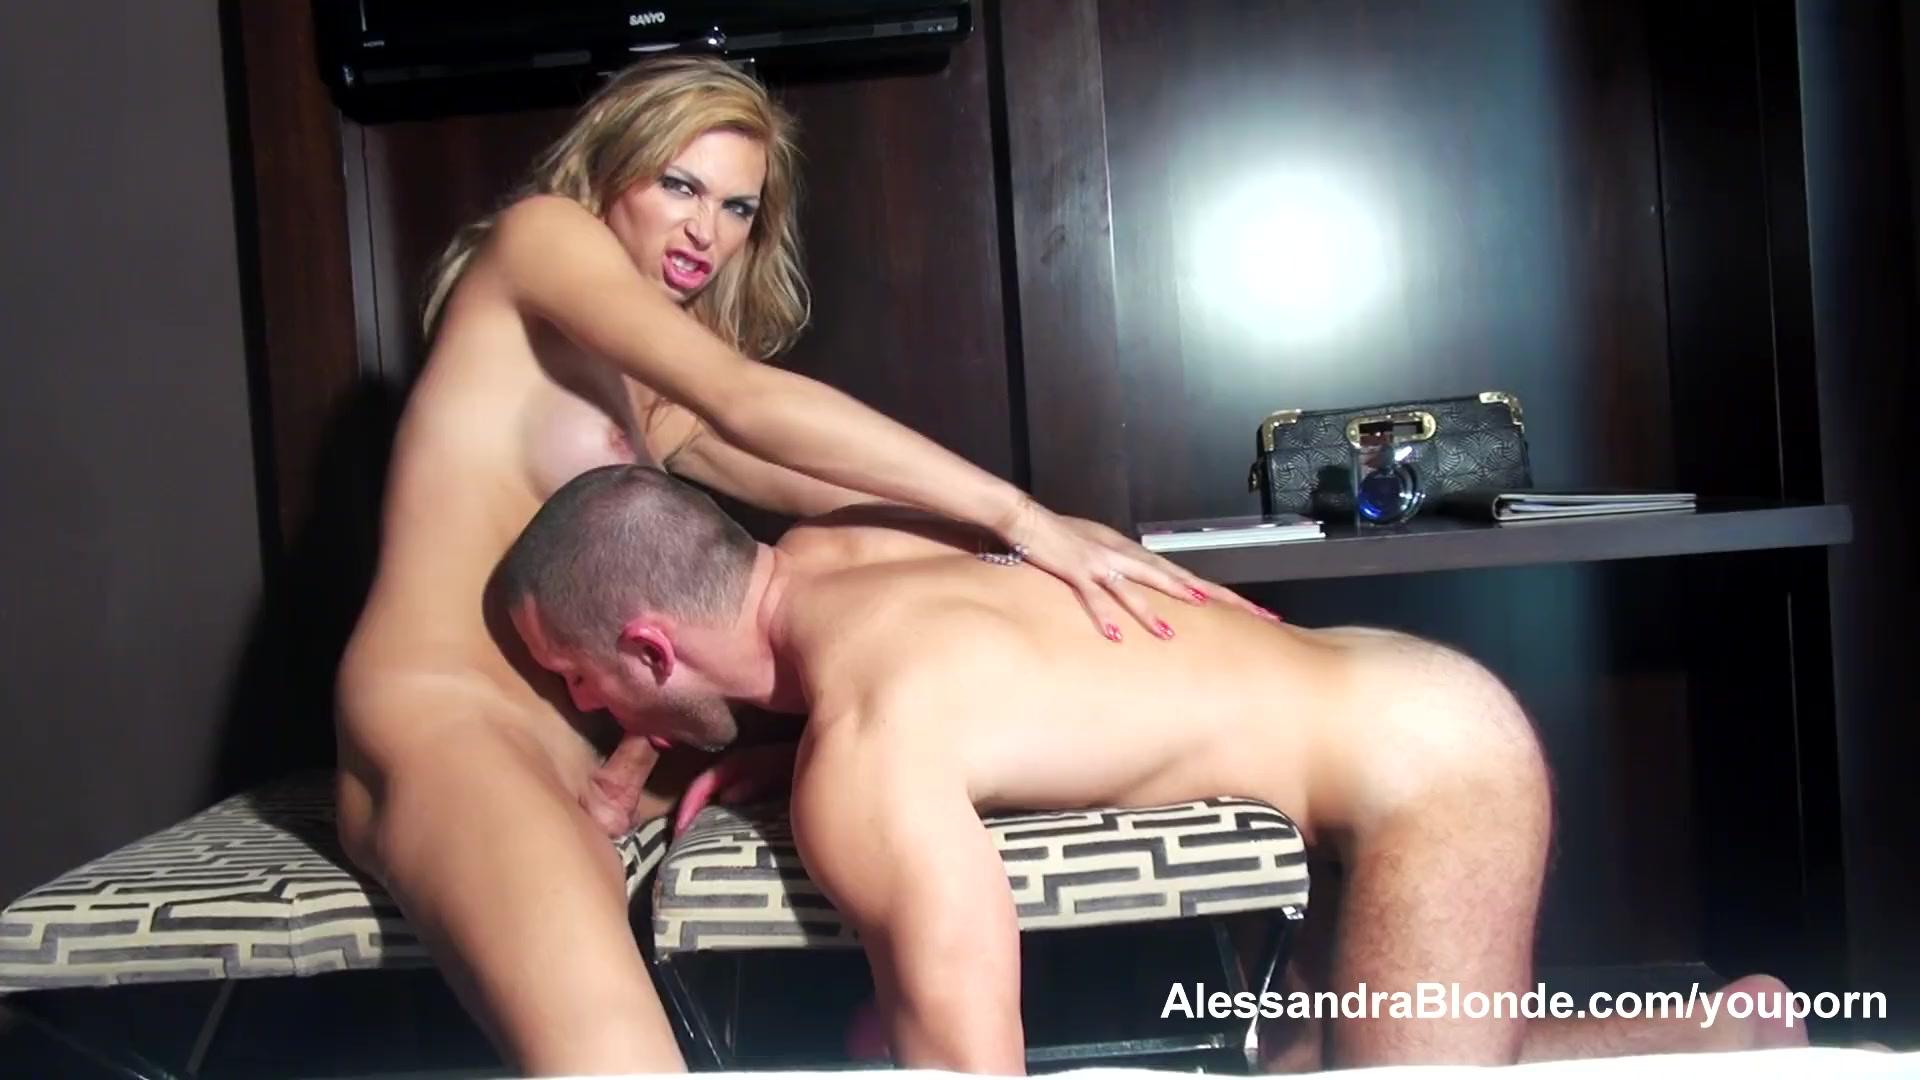 Alessandra blonde shemale pornstar model